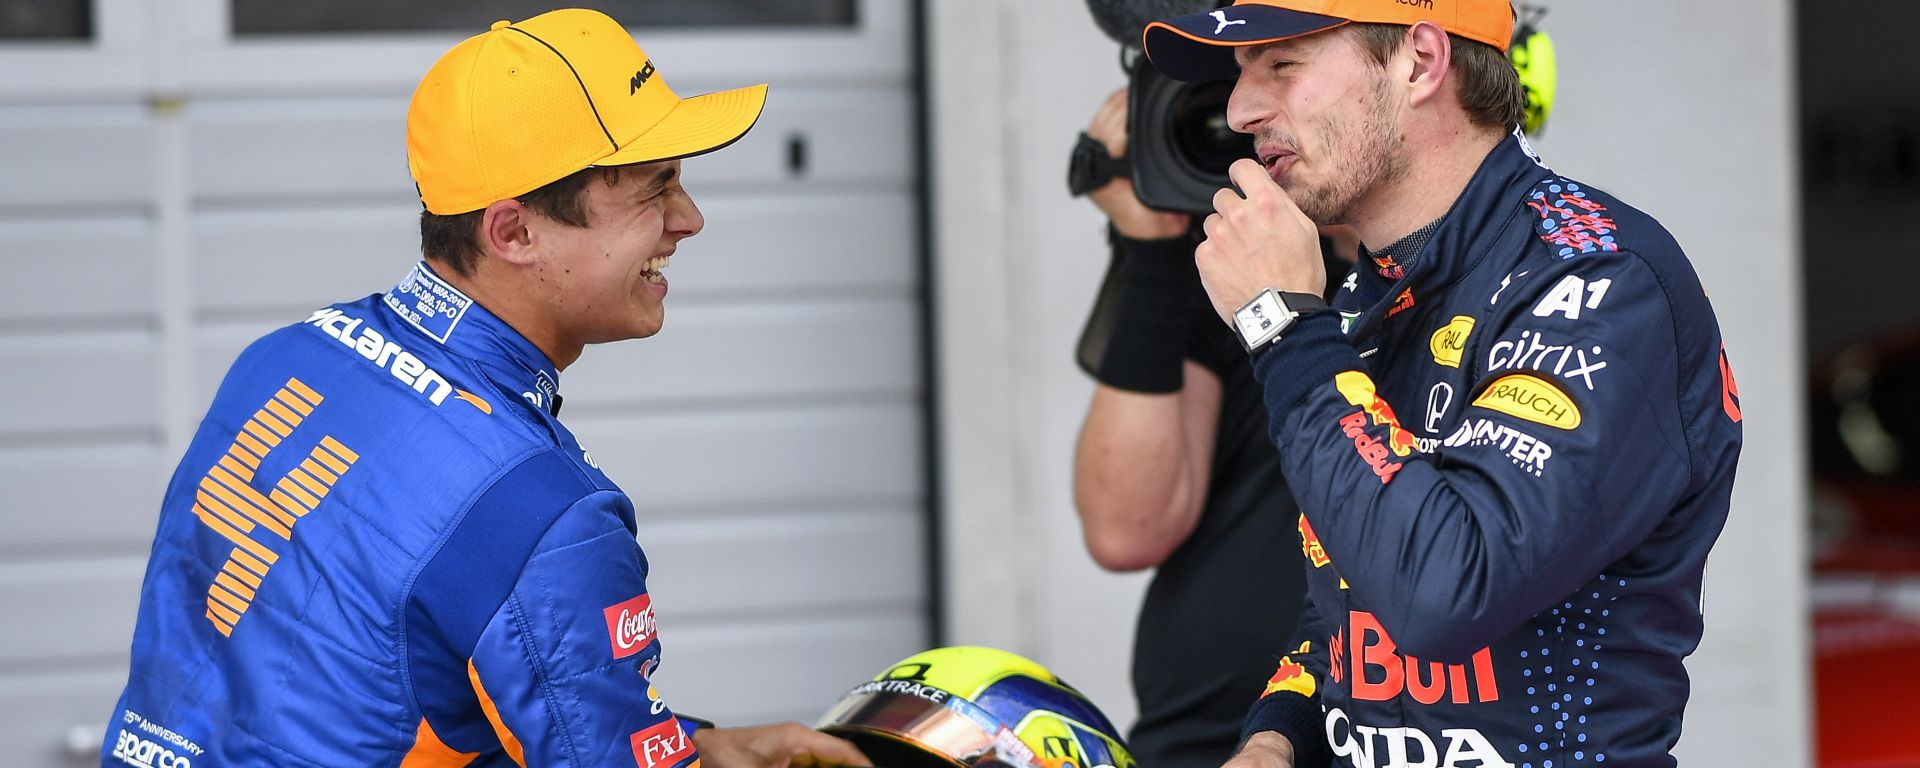 F1 GP Austria 2021, Spielberg: Norris (McLaren) e Verstappen (Red Bull) scherzano dopo la Q3